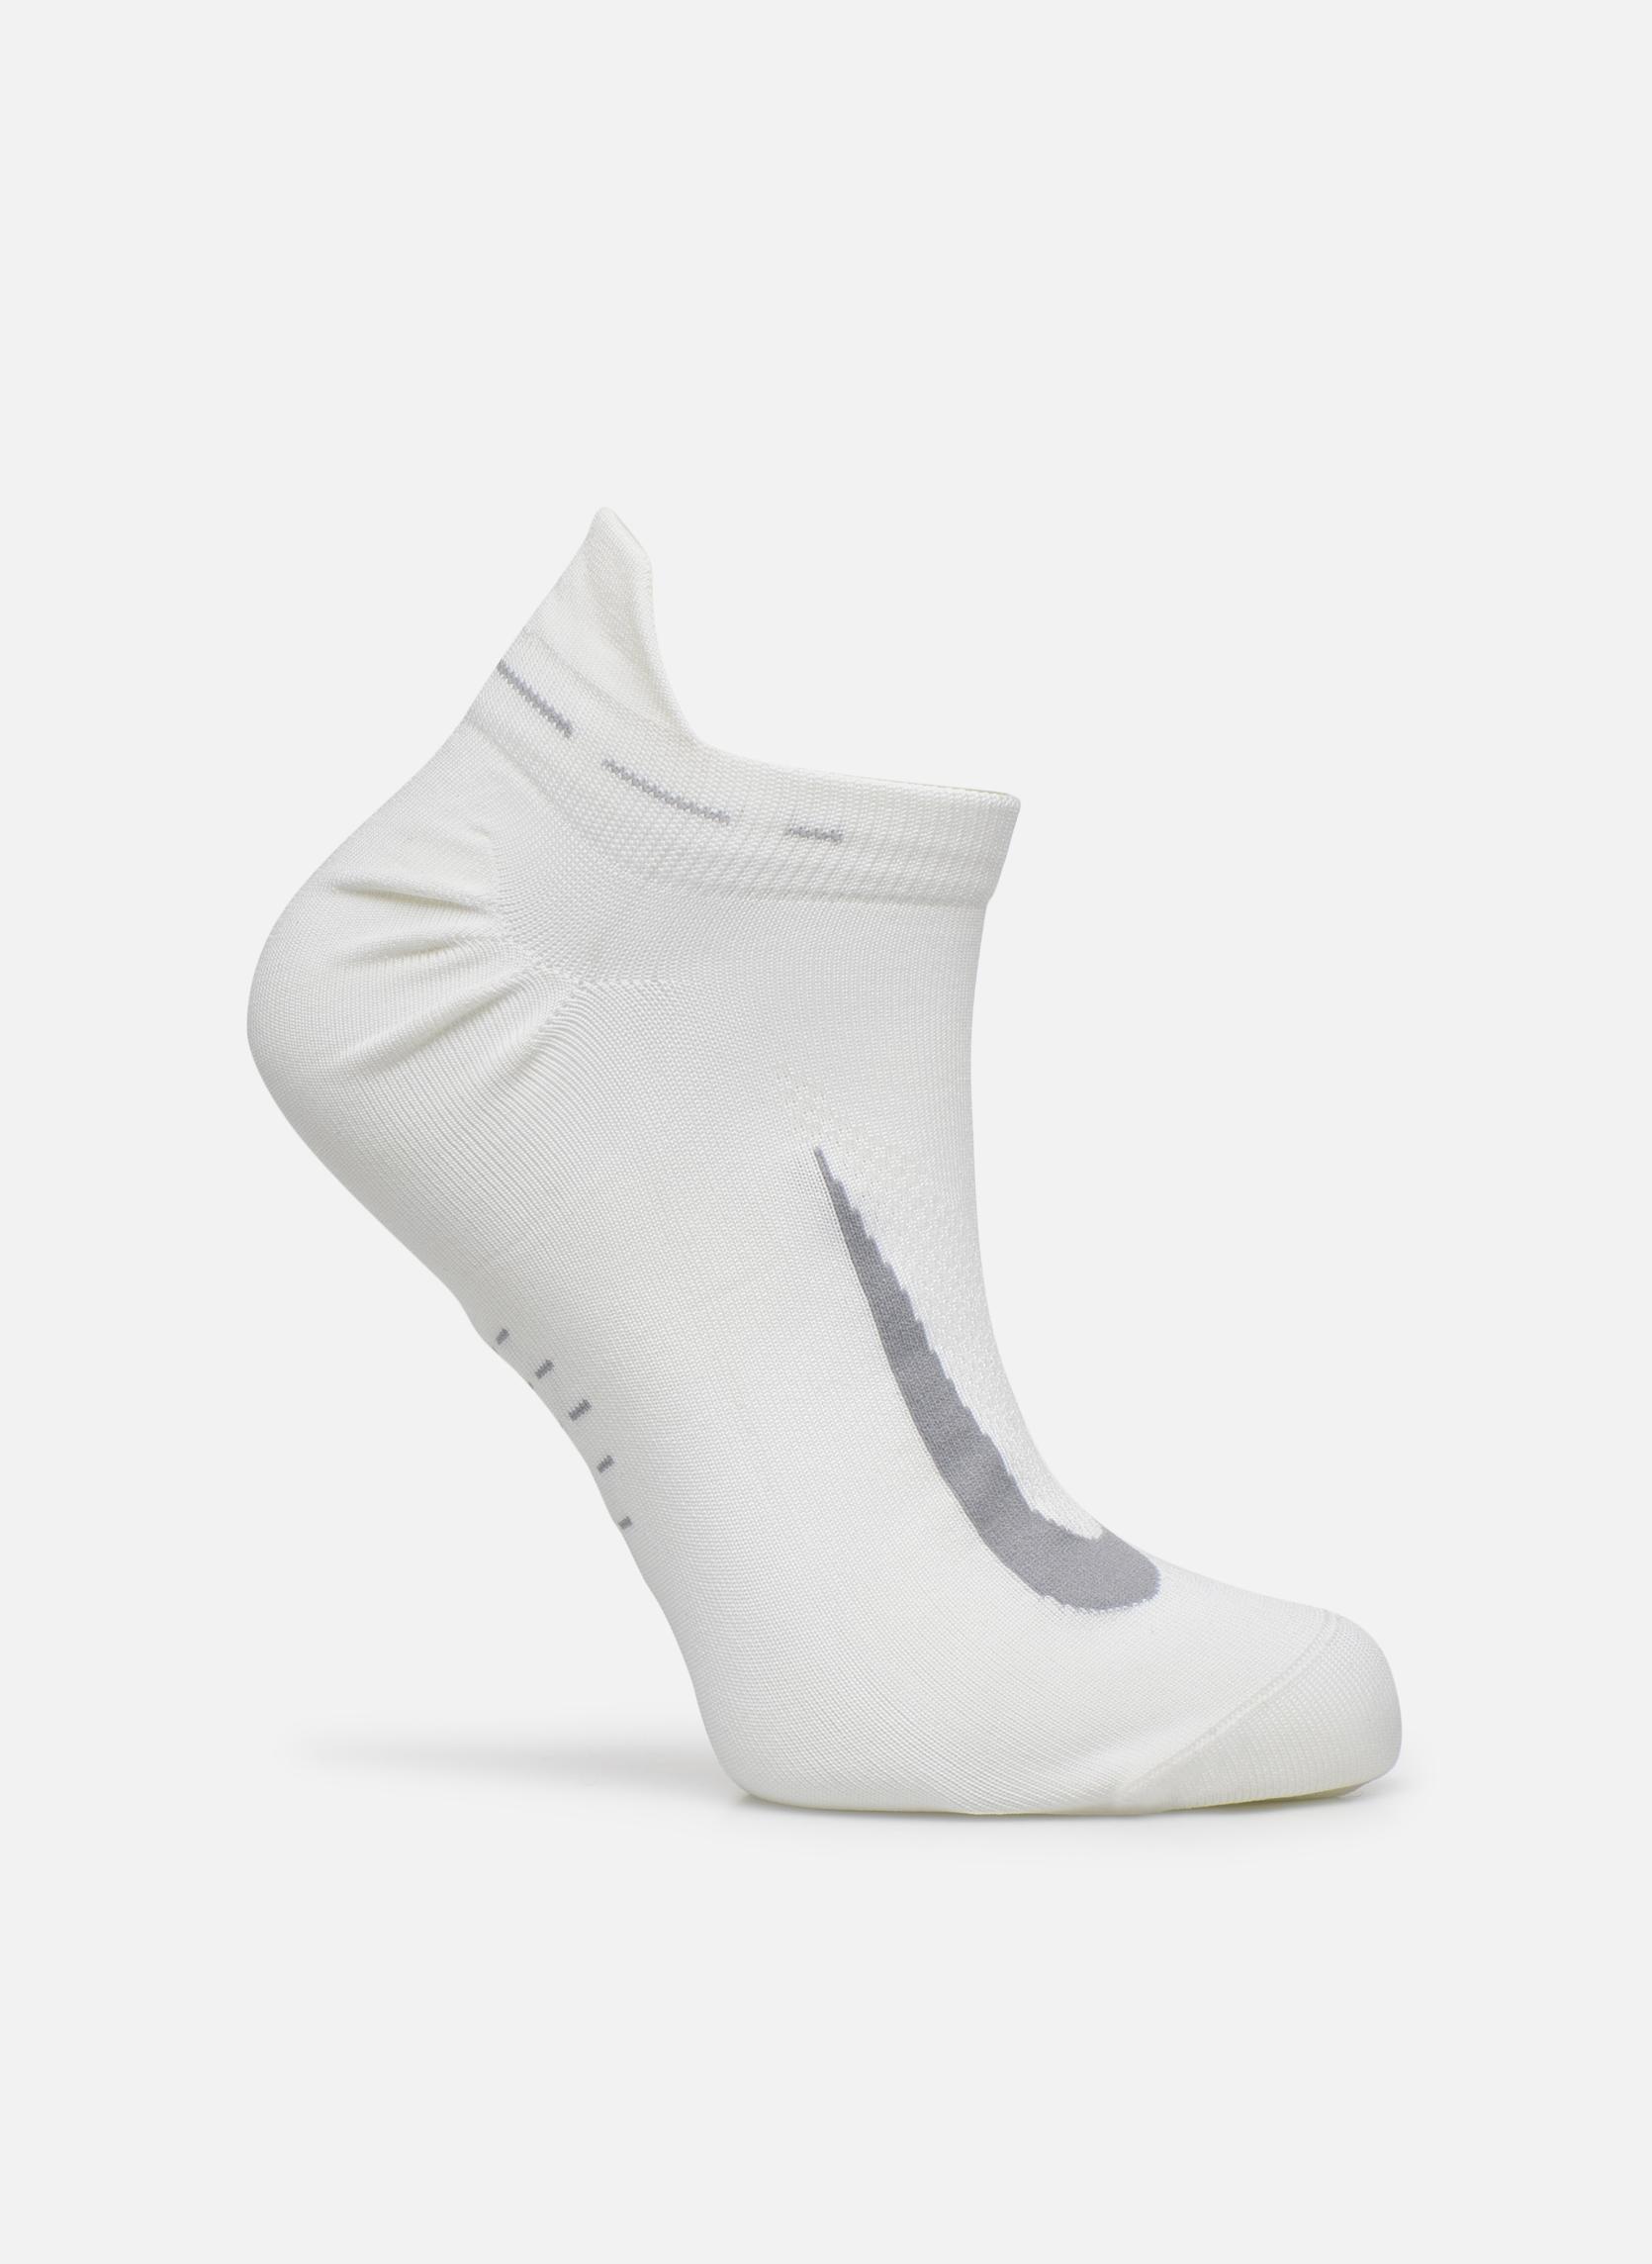 Chaussettes et collants Accessoires Nike Elite Lightweight No-Show Tab Running Sock